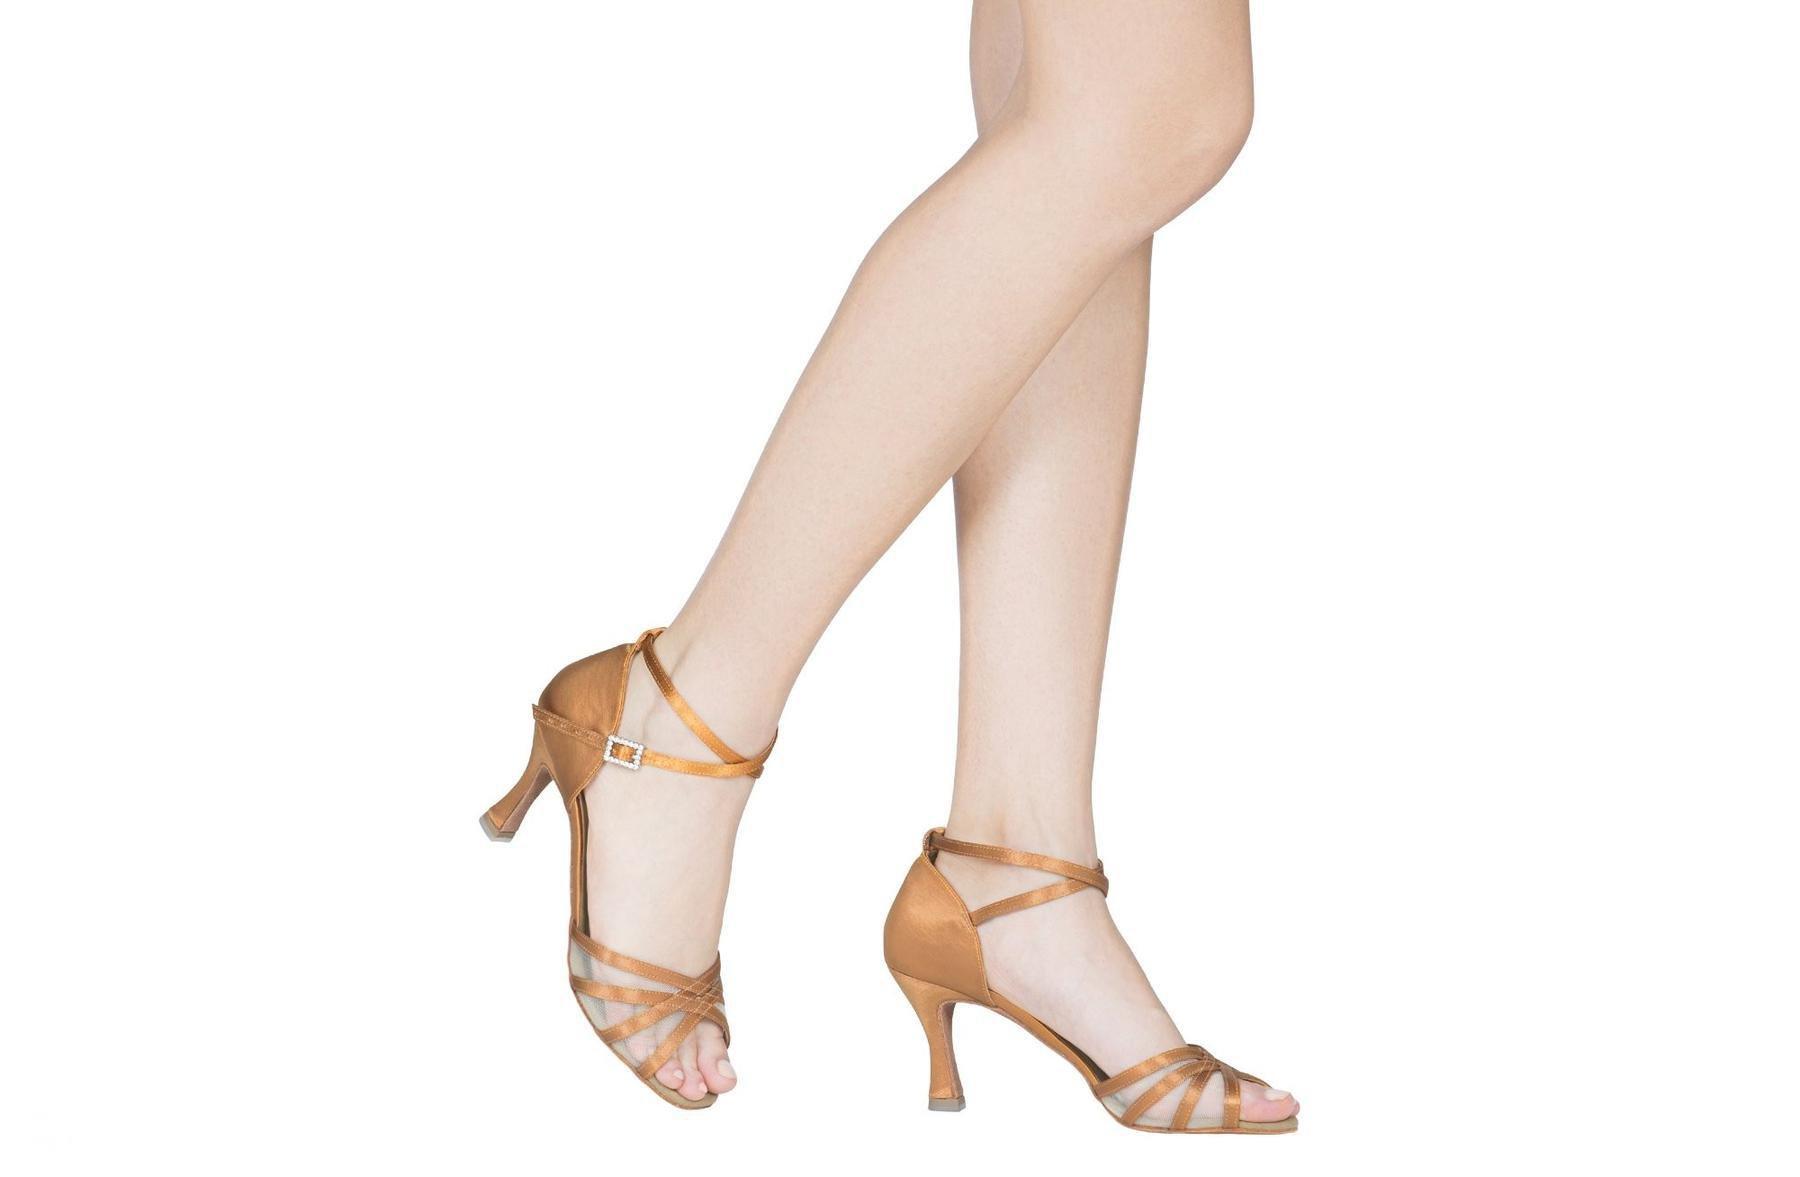 Dancin Scarpe da ballo donna rete raso flesh tacco cm 7,5